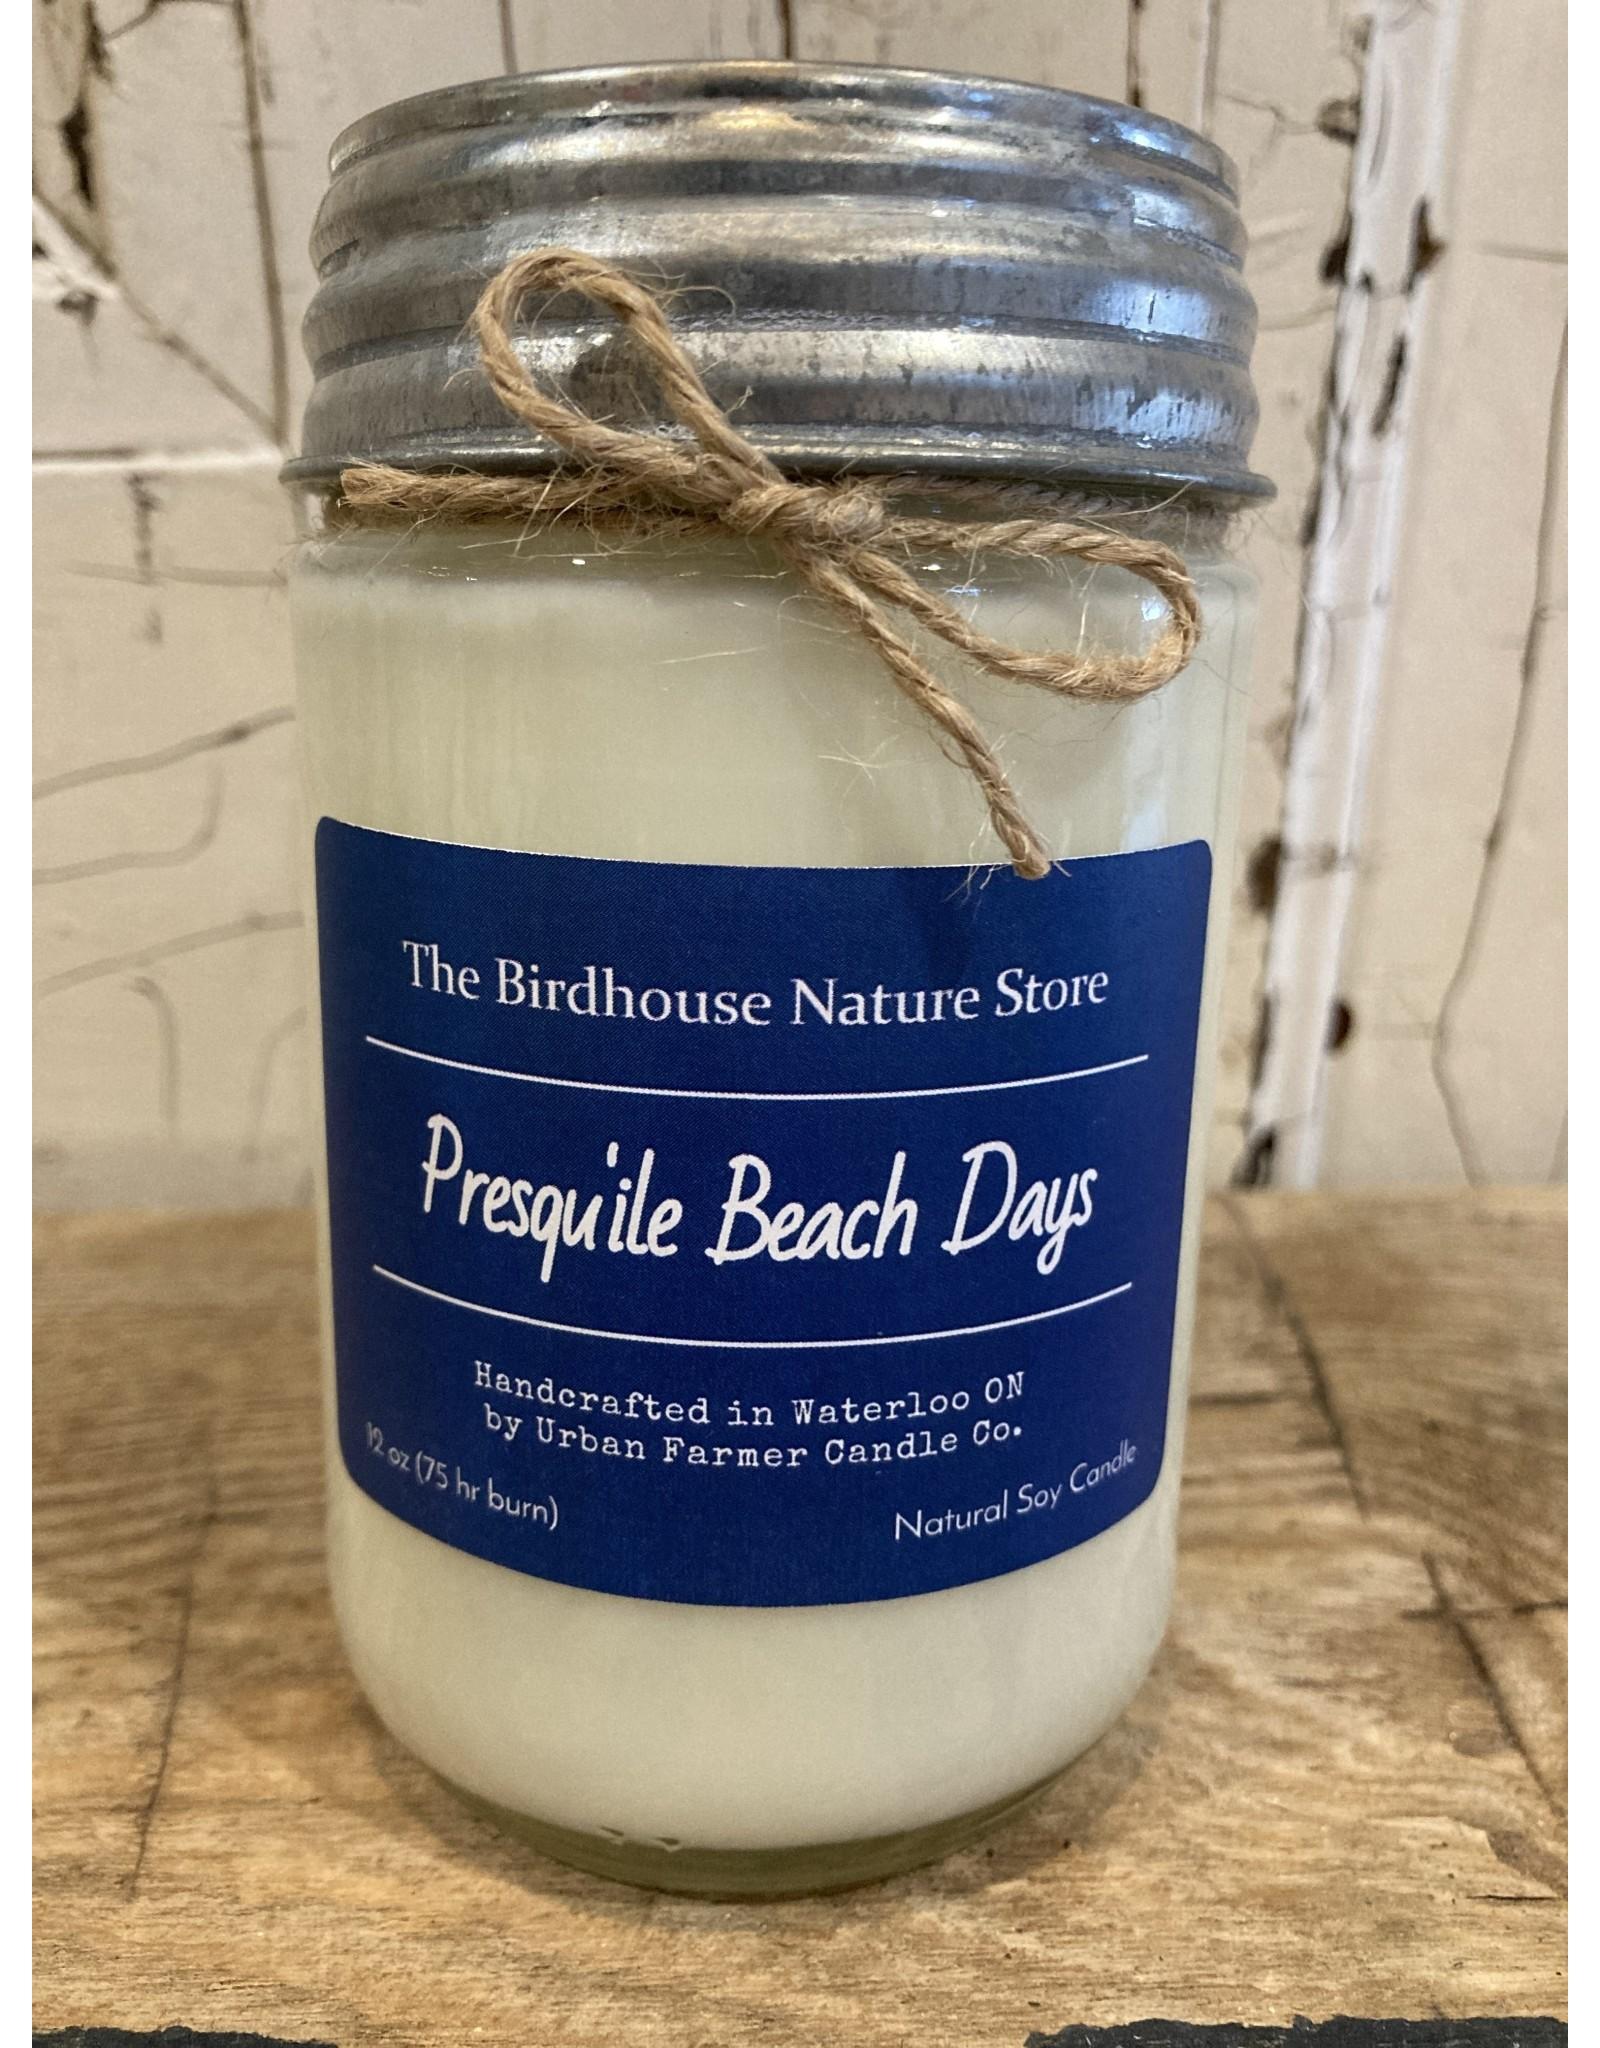 Urban Farmer Candle Co UFCCPBD Presqu'ile Beach Days Natural Soy Candle, 12 oz